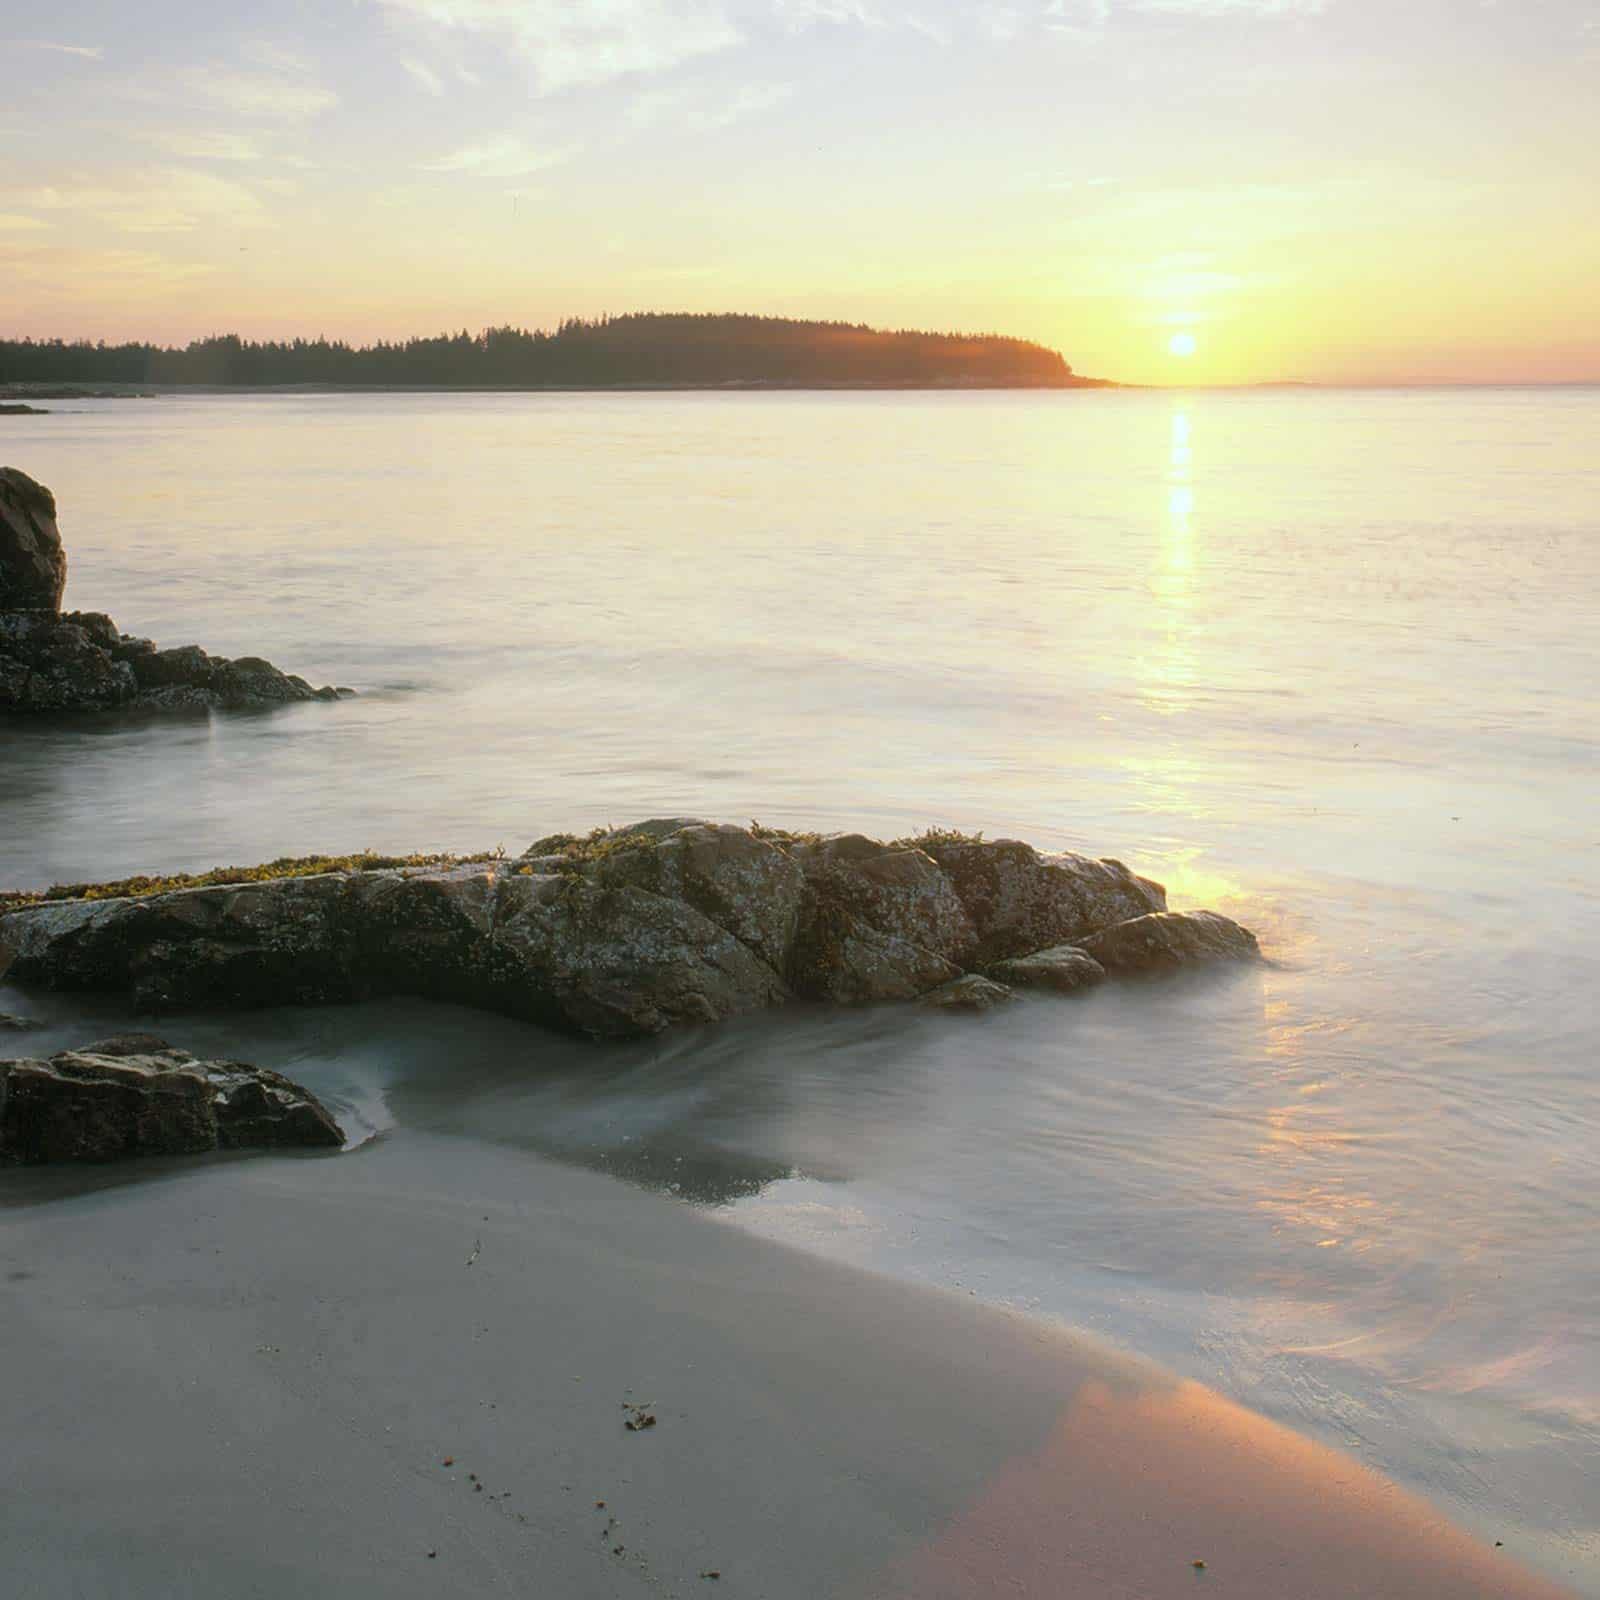 mcht-Sunrise_Over_Beach_on_NE_Side_of_Marshall_Island_Maine_-_2000_-_Sara_Gray-square